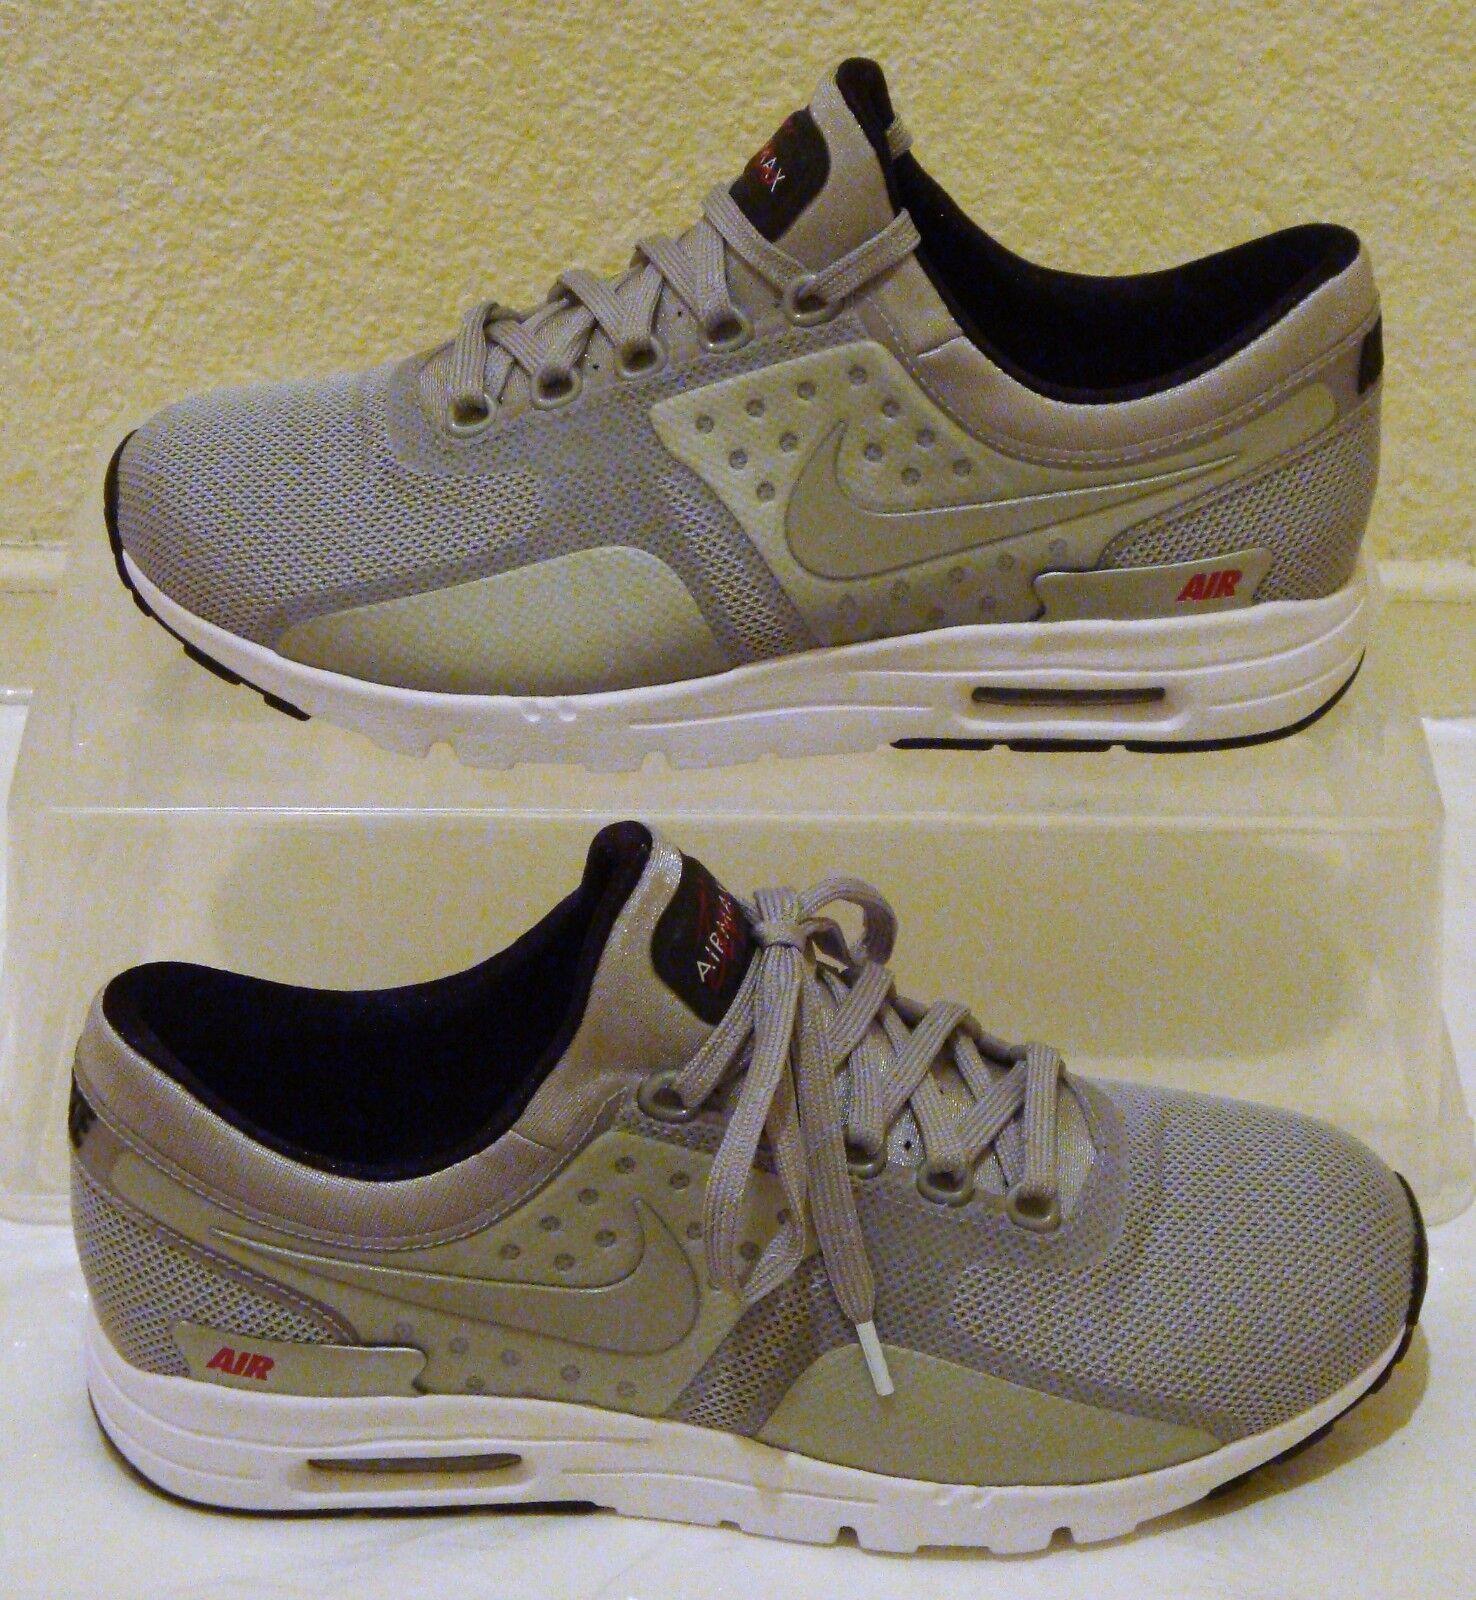 New Nike Shoes Air Max Zero QS Metallic Silver Womens US Size 7